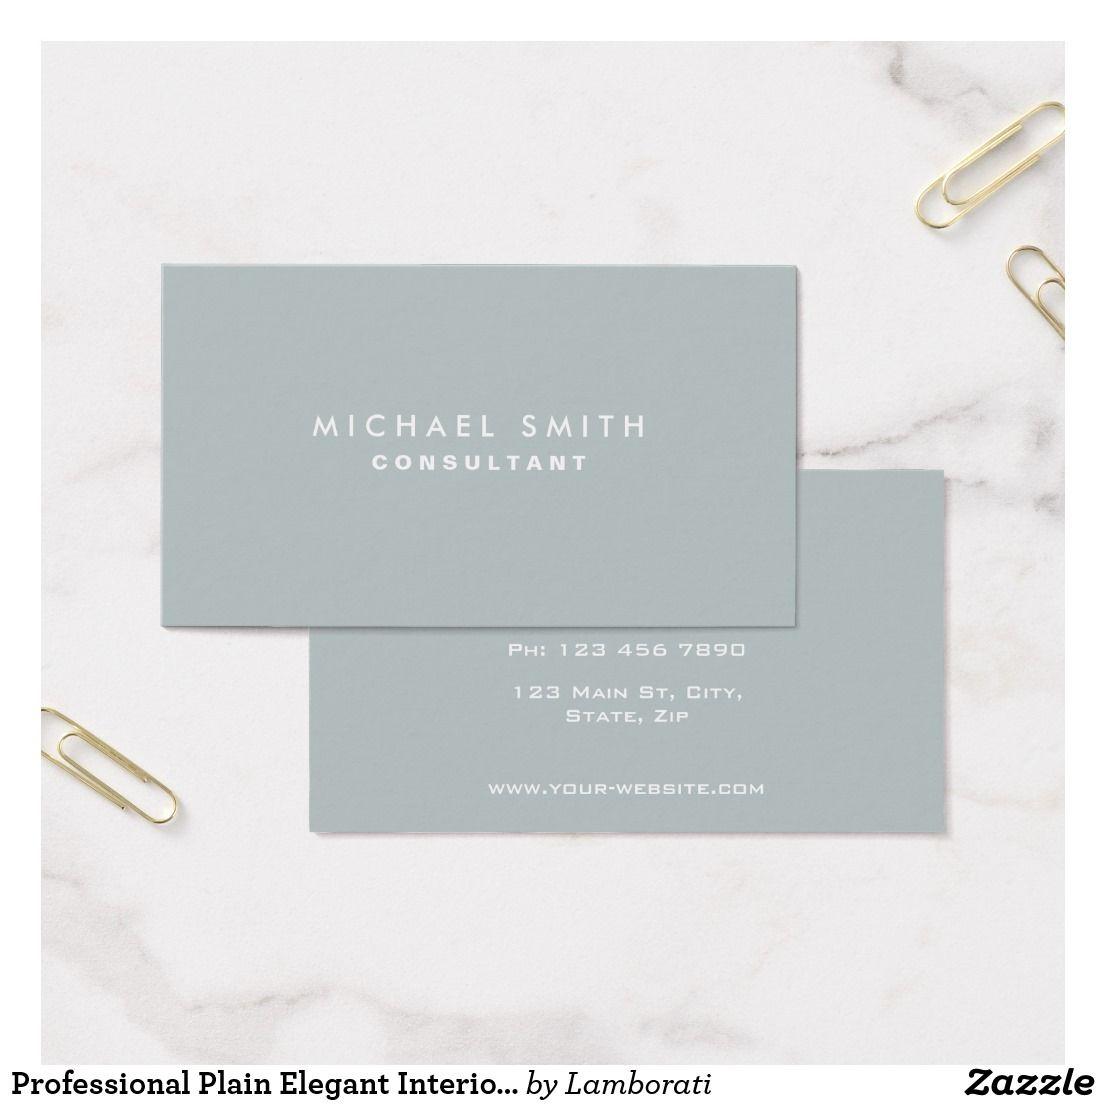 Professional Plain Elegant Interior Decorator Gray Business Card ...